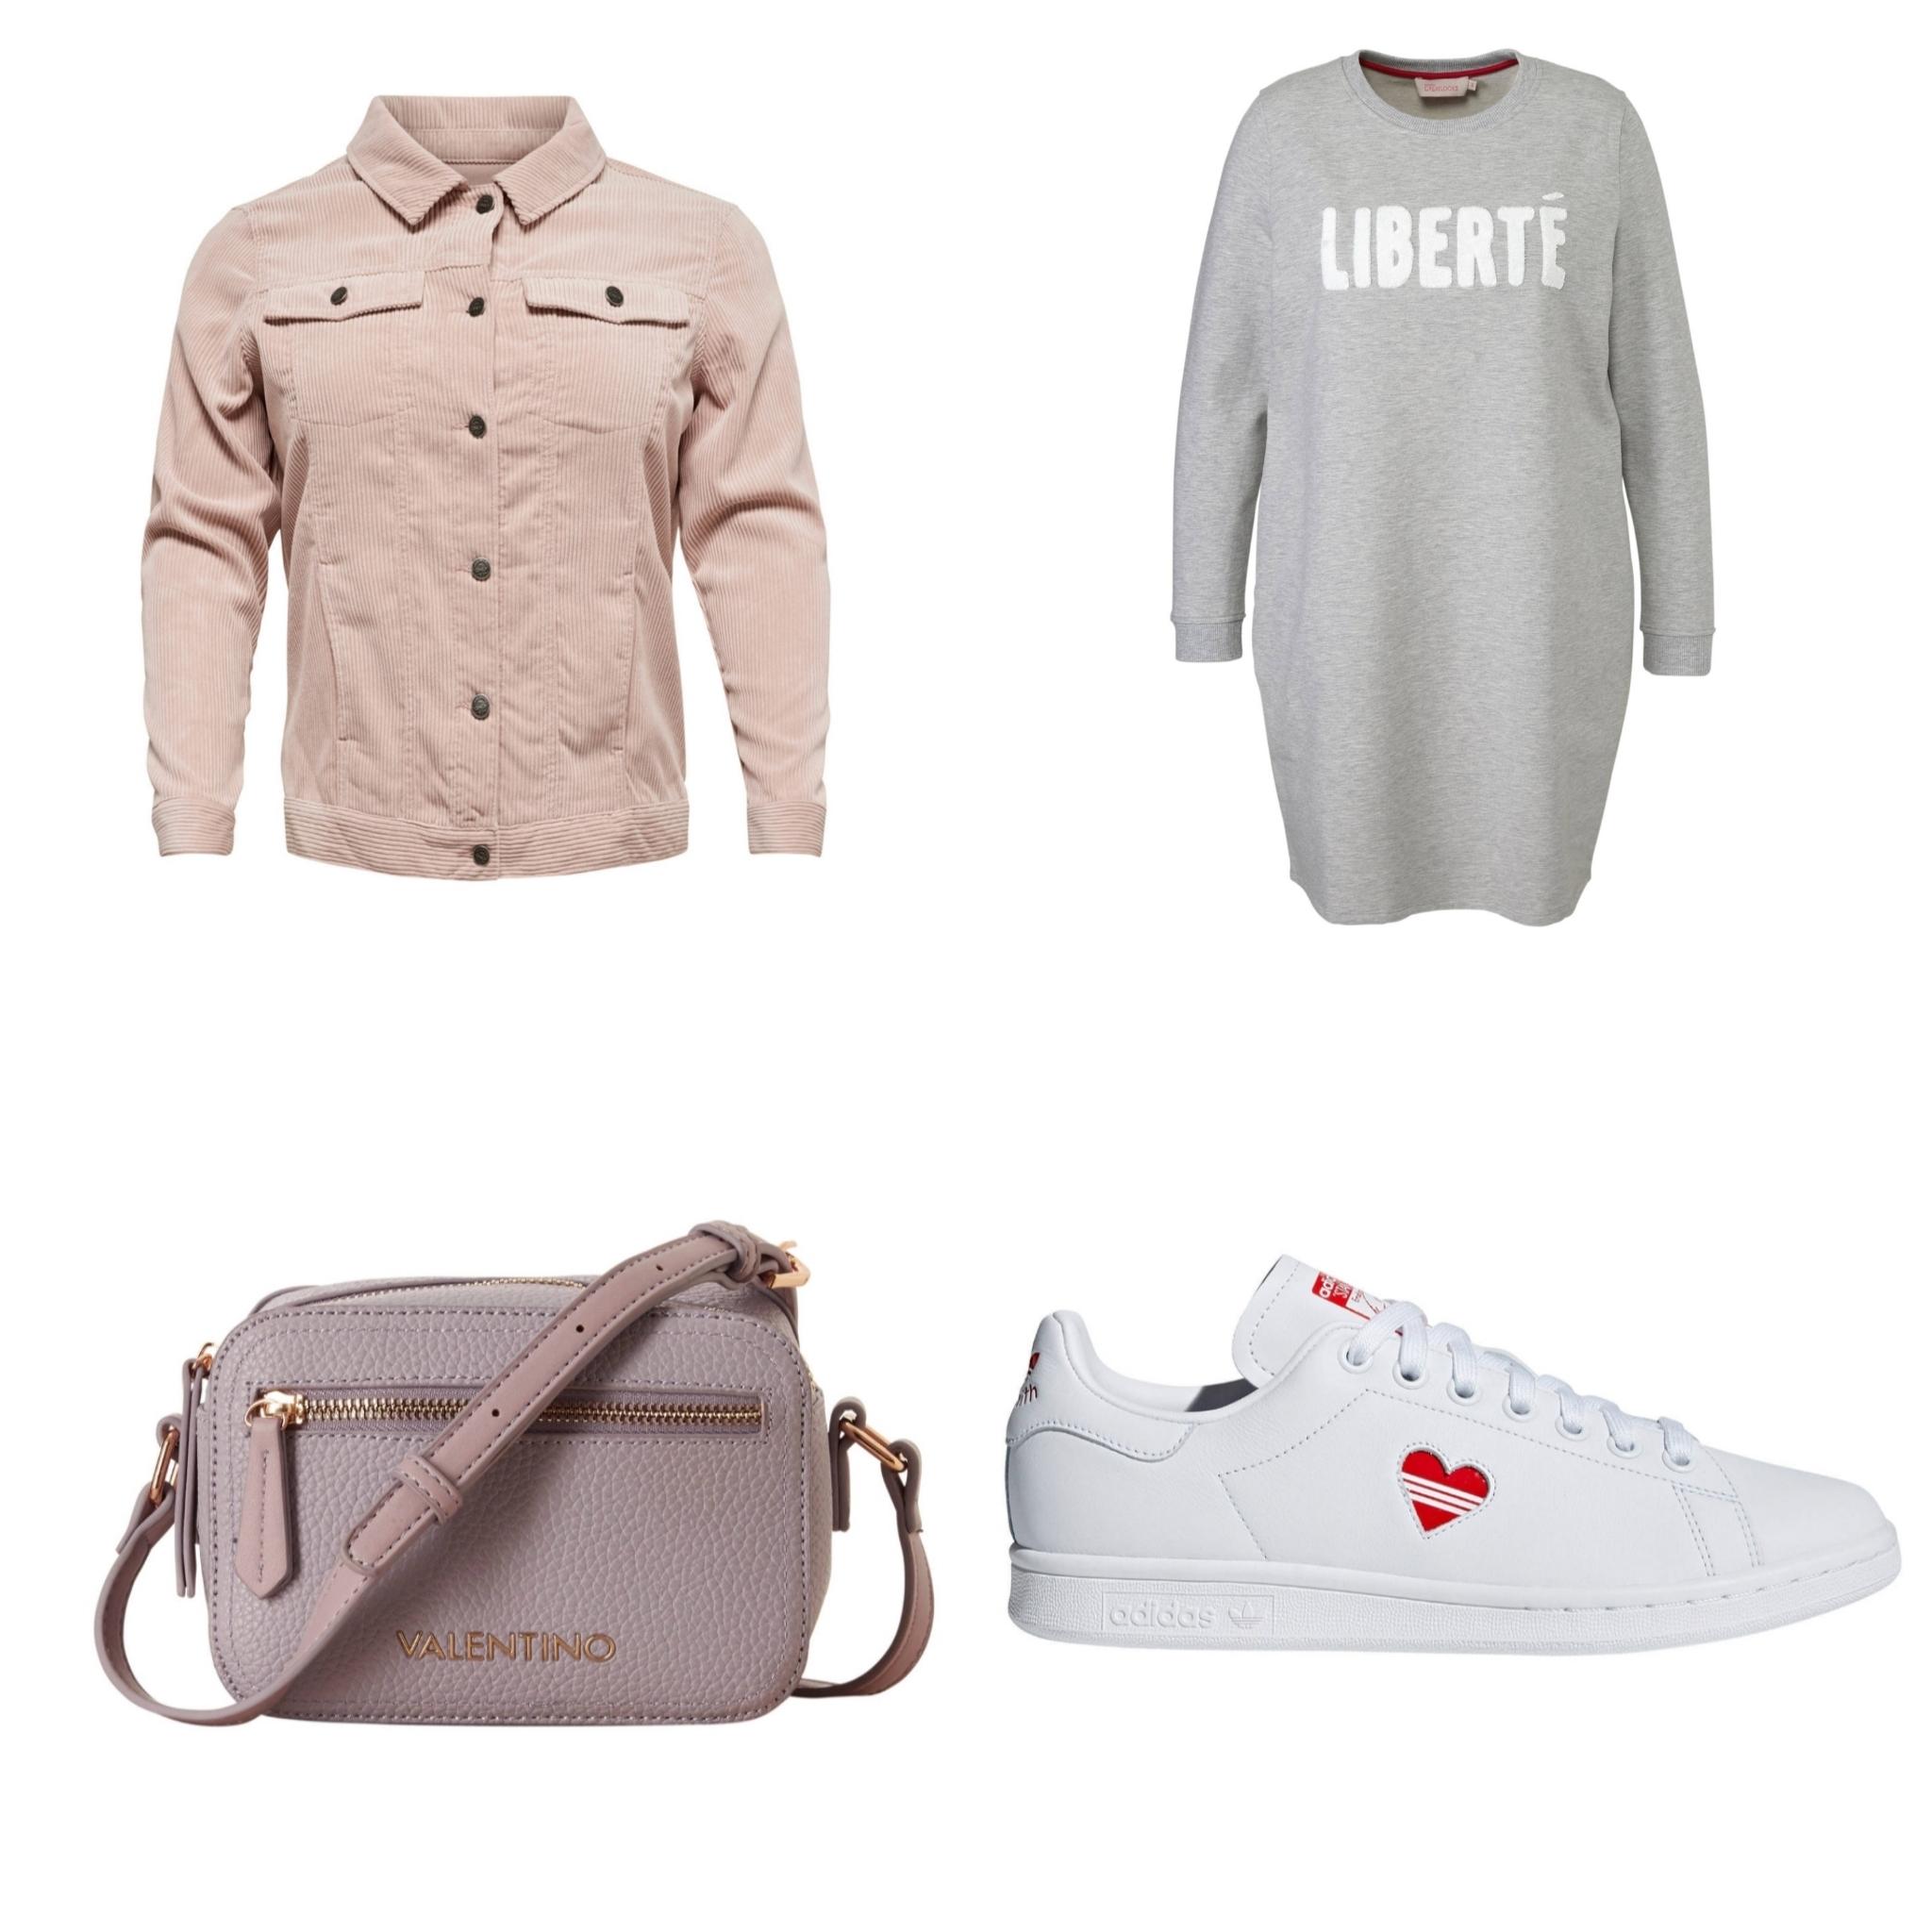 Plus Size Fashion Friday || Pastel spring vibes